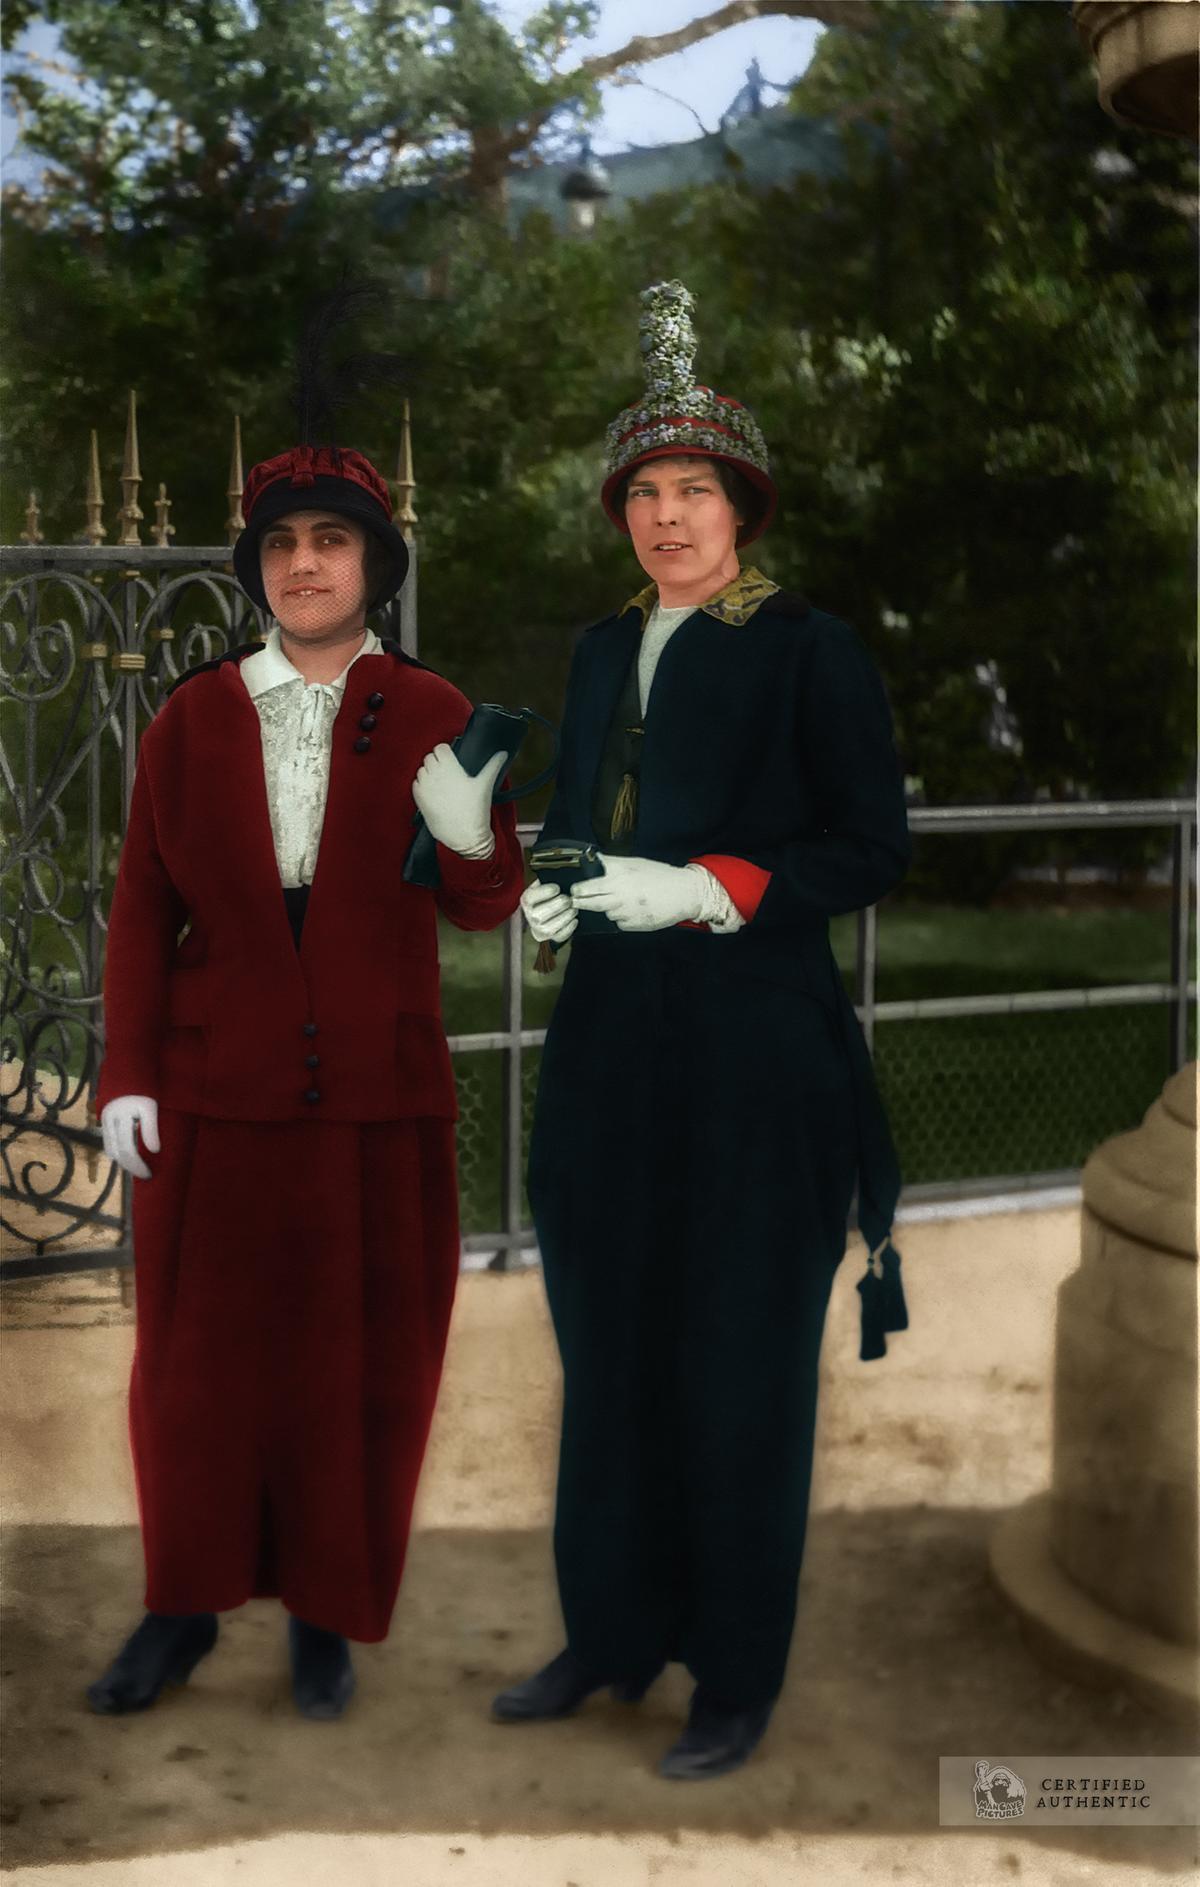 American ladies at the Jardin des Tuileries, Paris, 1913